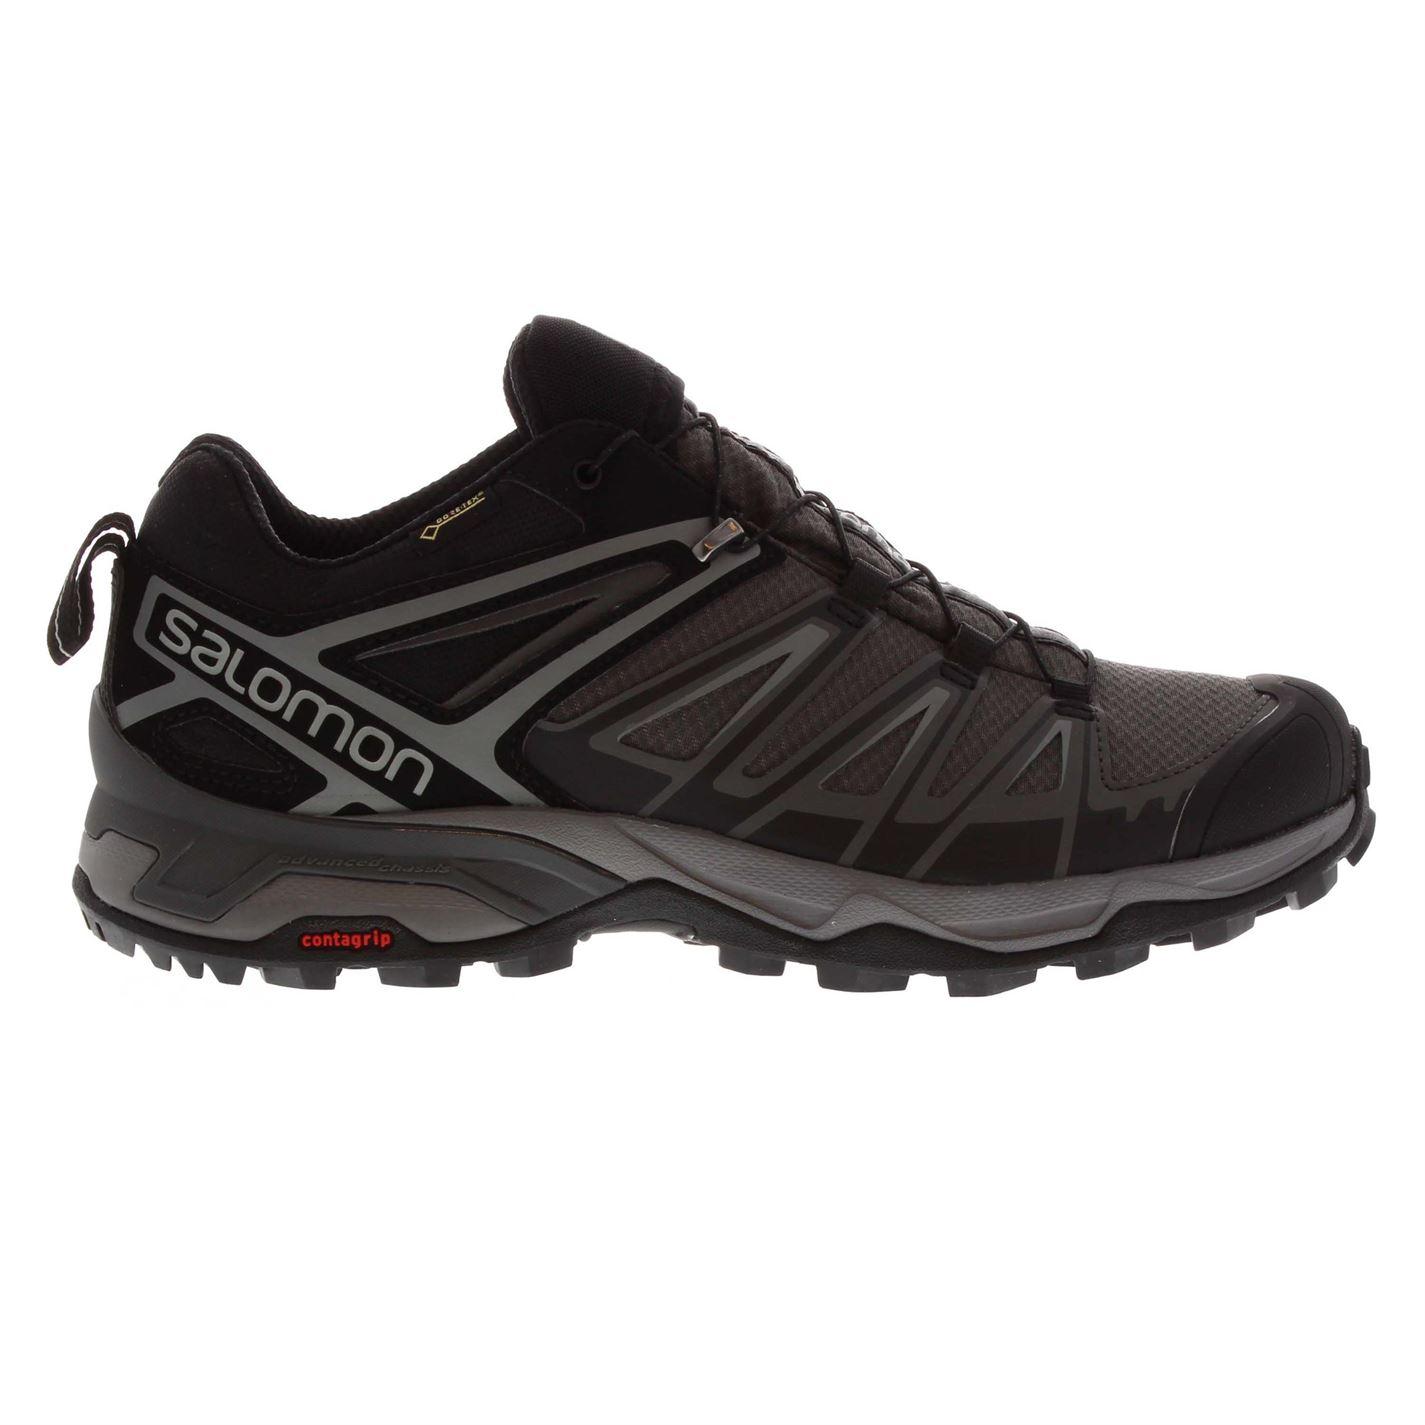 boty Salomon X Ultra 3 GTX Low pánské Walking Shoes